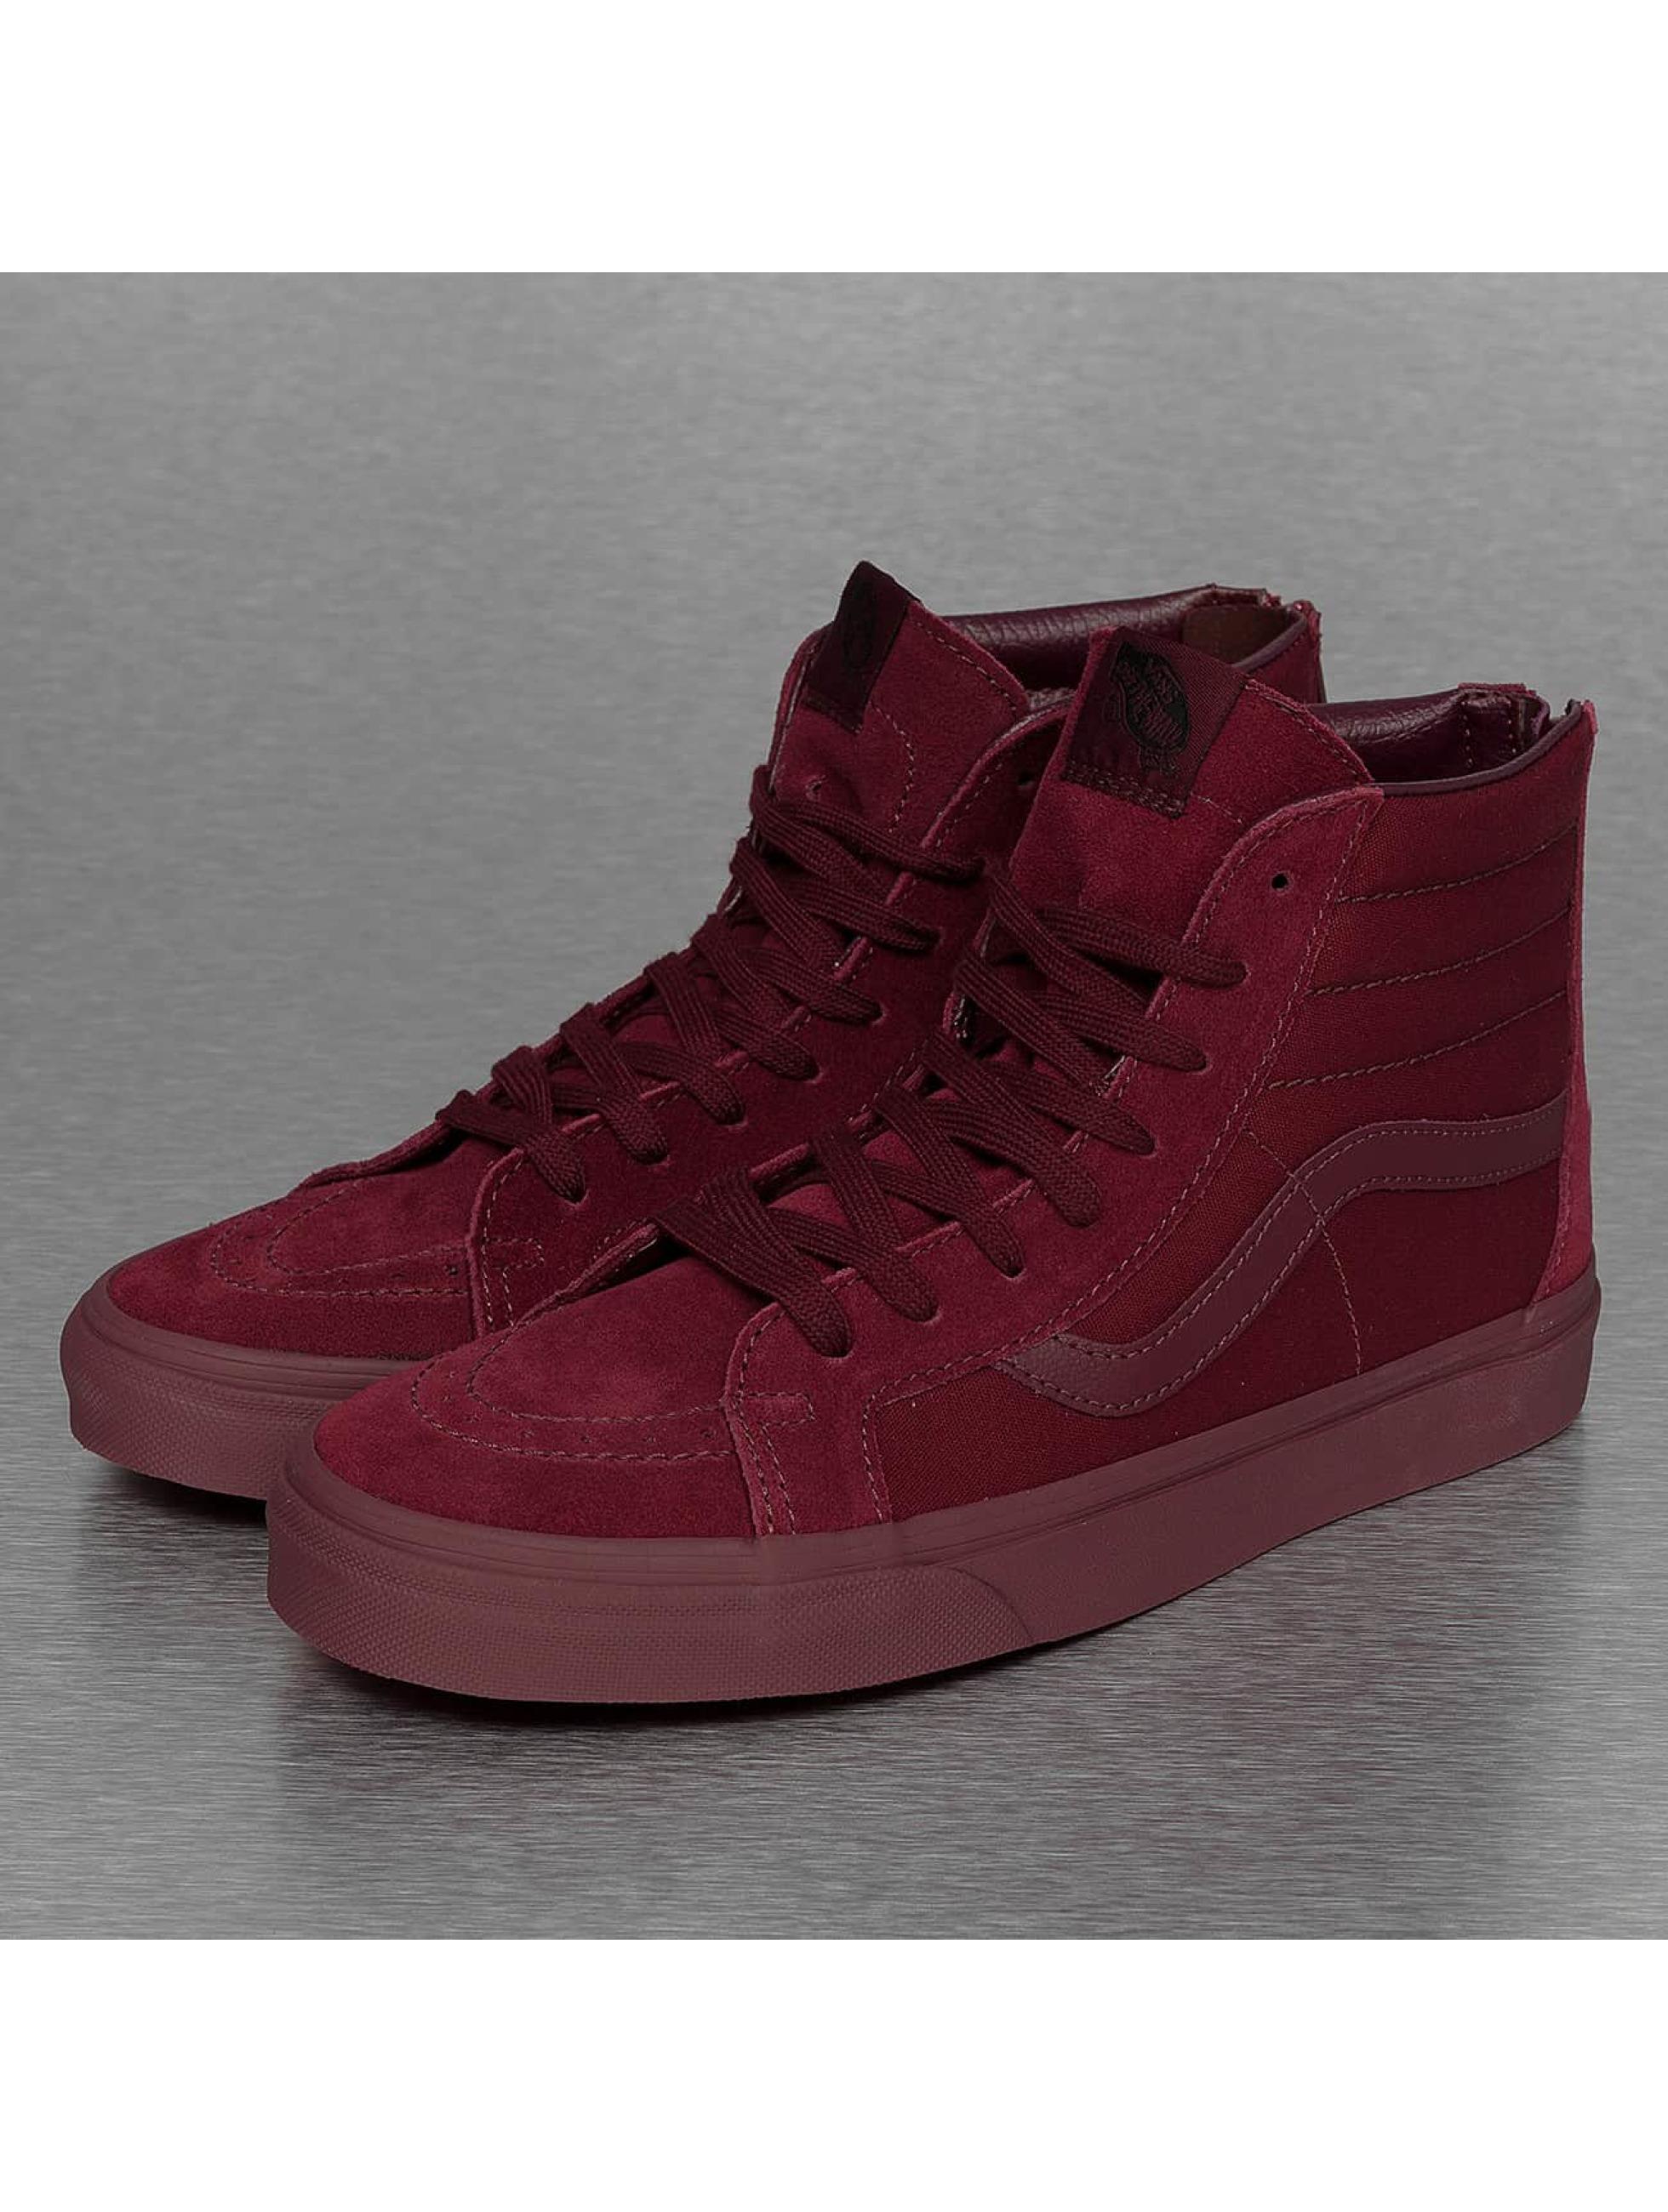 Sneaker SK8-Hi Reissue Zip in rot